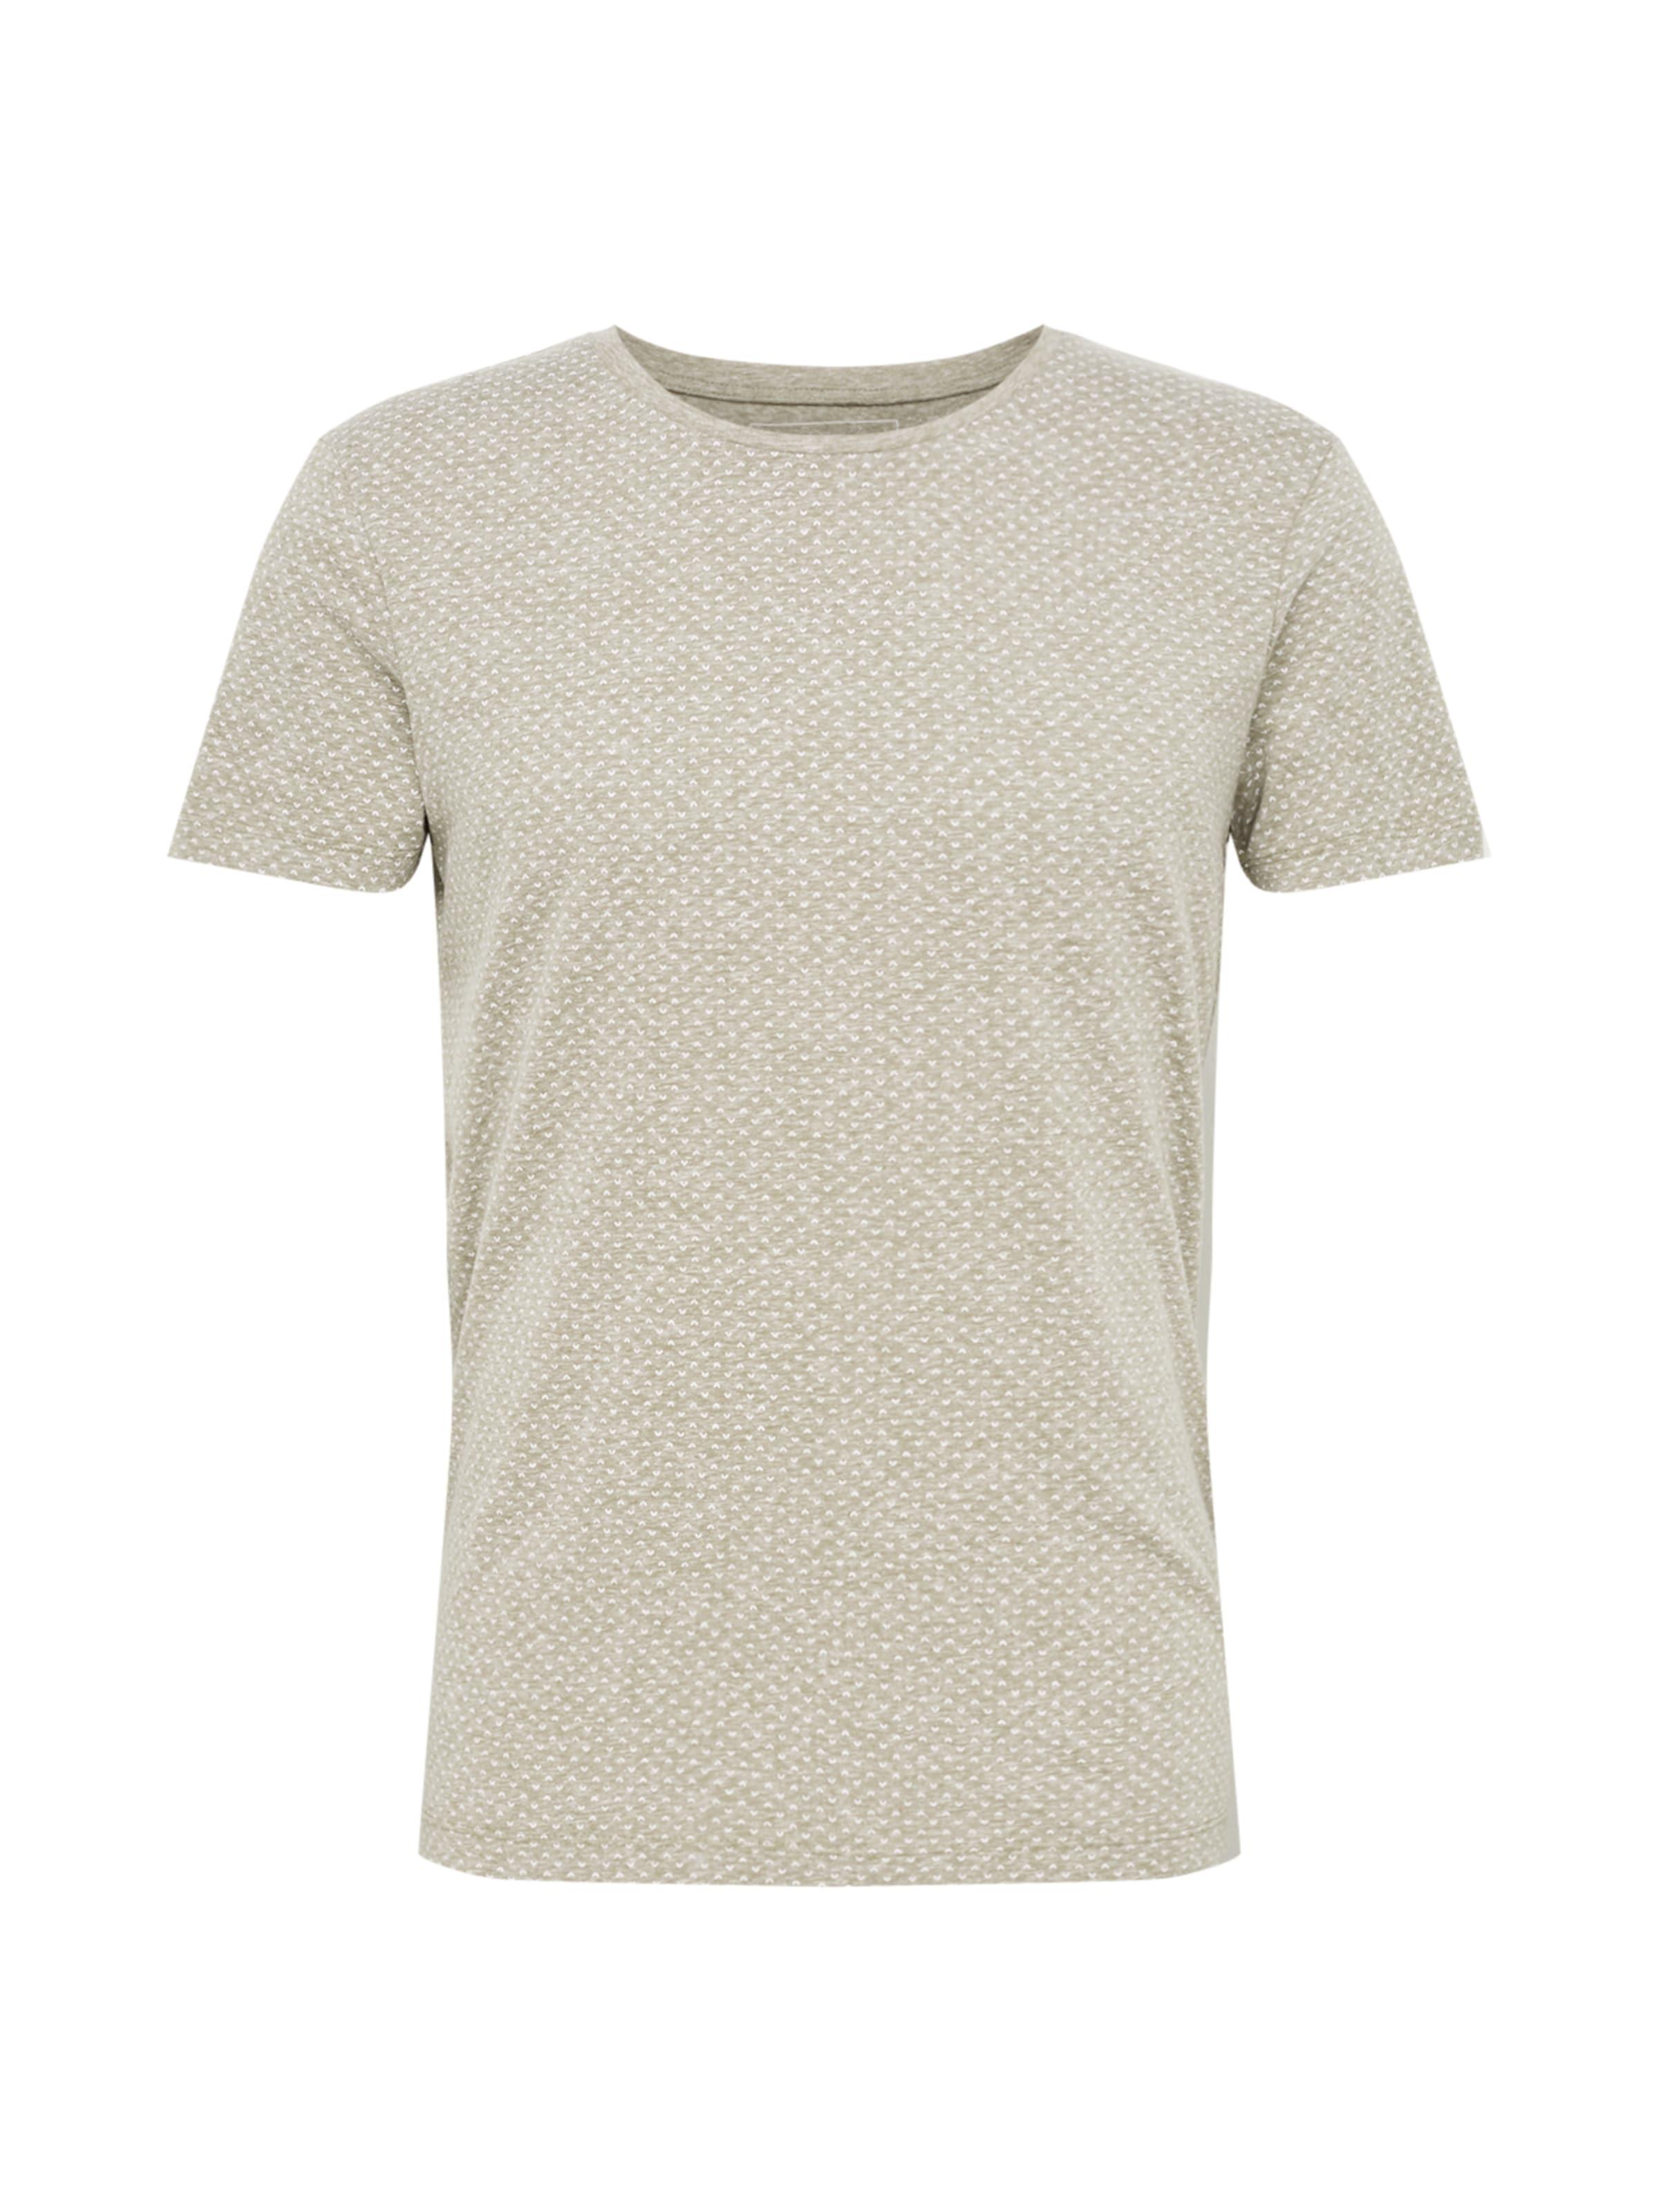 Denim In Tom Grau Tailor Shirt qVpzULSMG